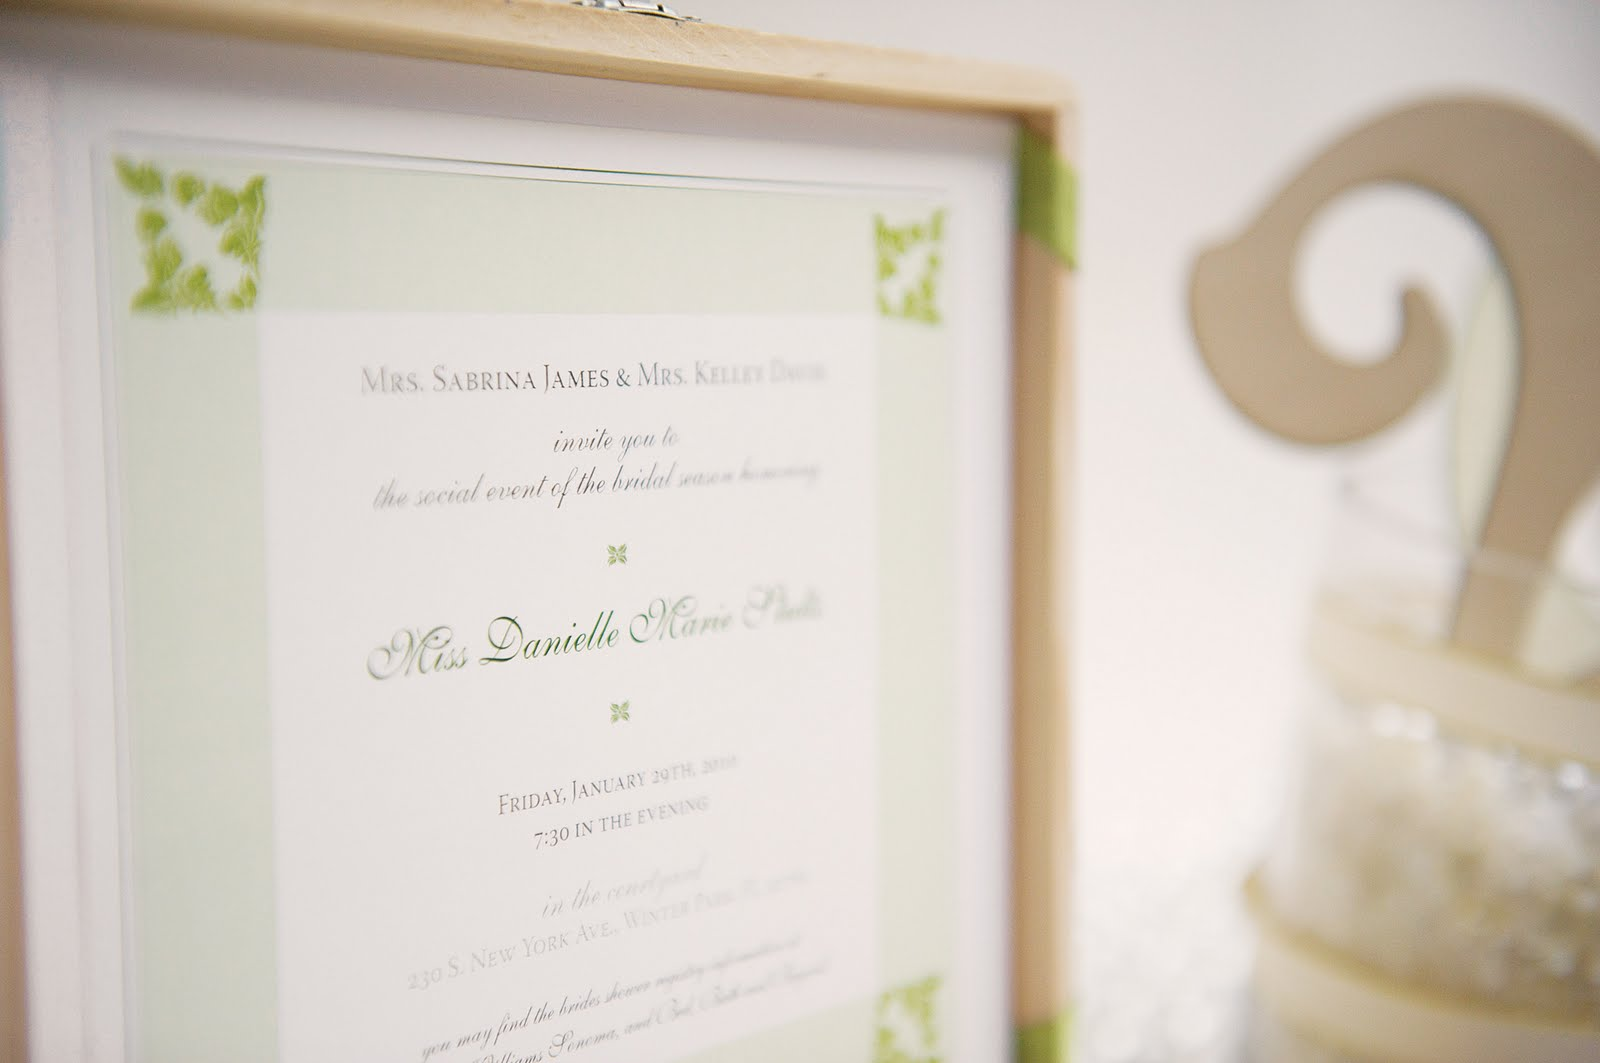 great gatsby wedding shower invitations gatsby wedding invitations modern day great gatsby wedding style